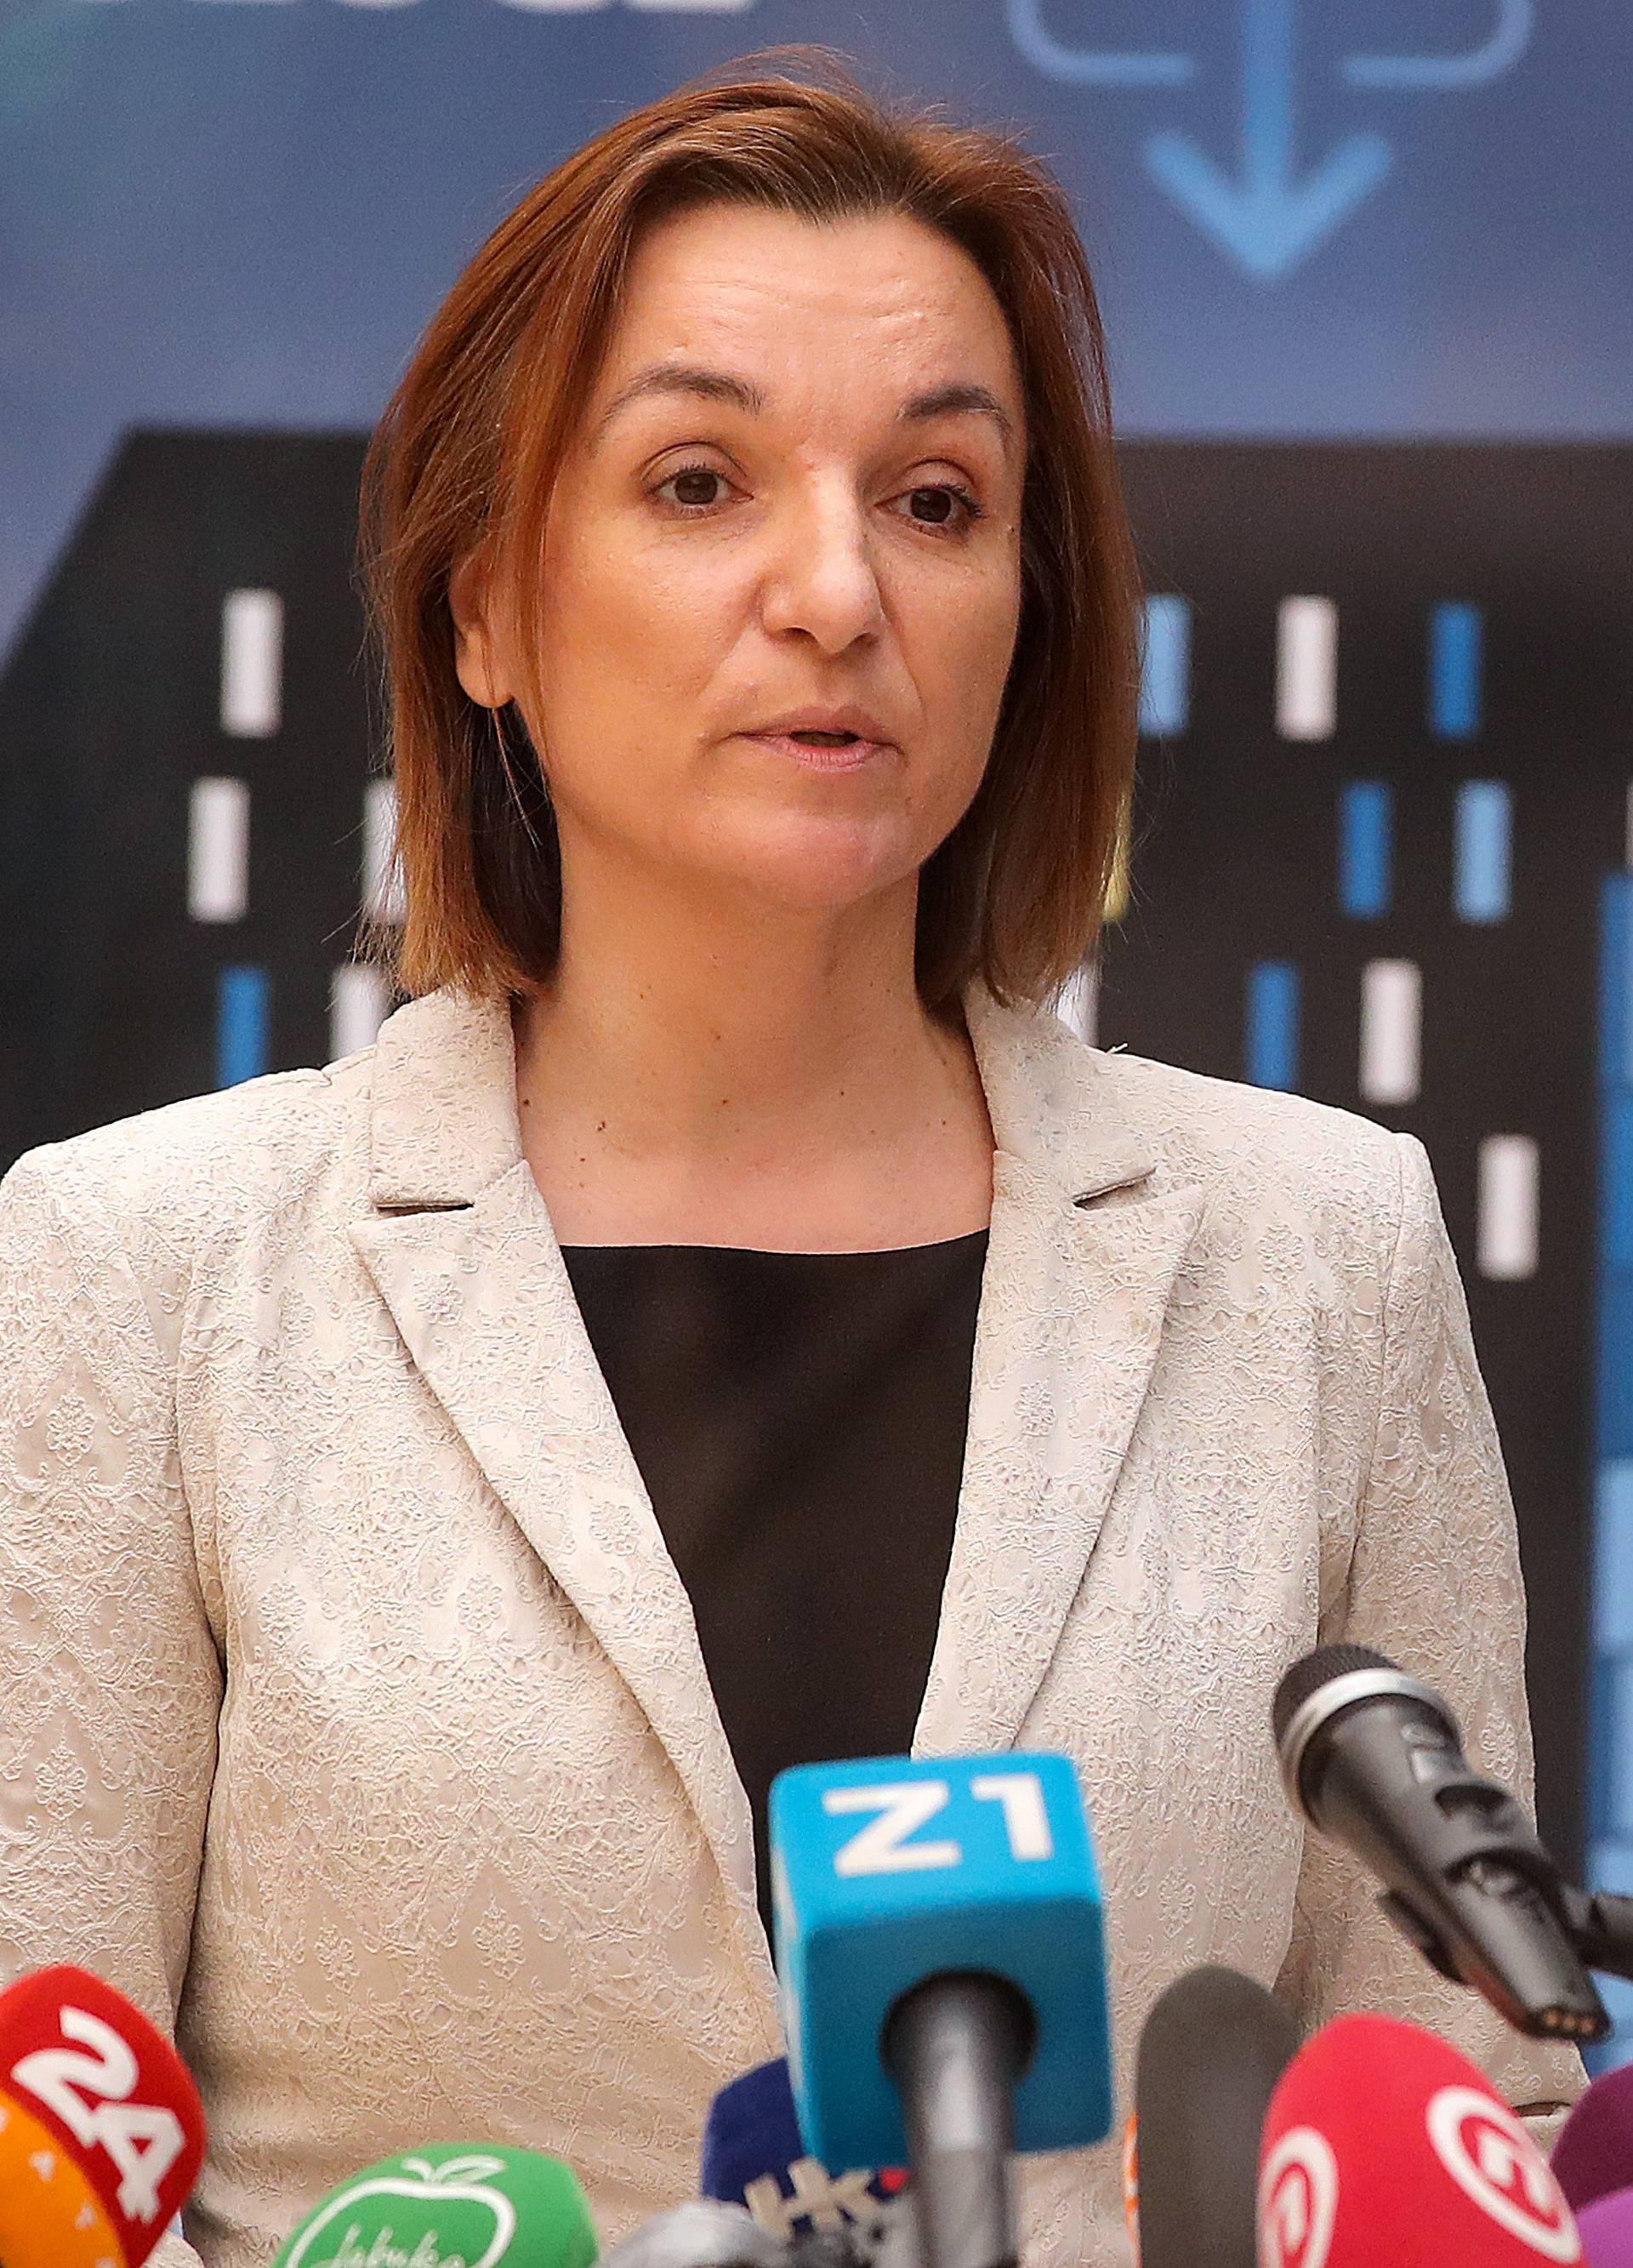 Zagreb: Konferencija za medije Stožera civilne zaštite i gradonačelnika Milana Bandića